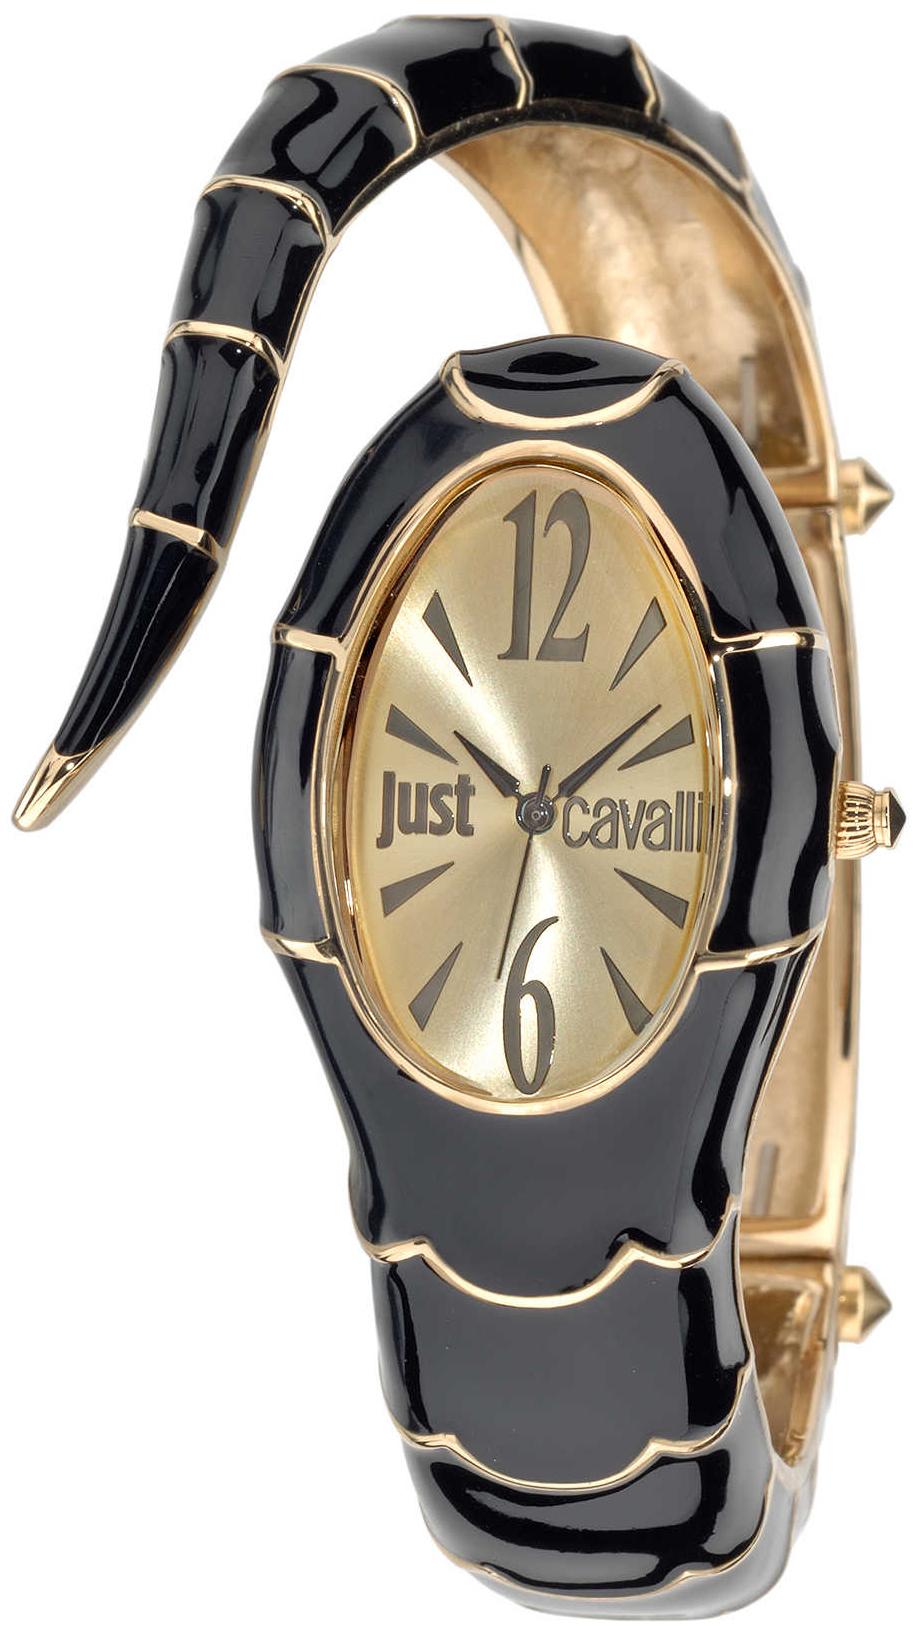 Just Cavalli Poison Dameklokke R7253153508 Gulltonet/Gulltonet stål - Just Cavalli